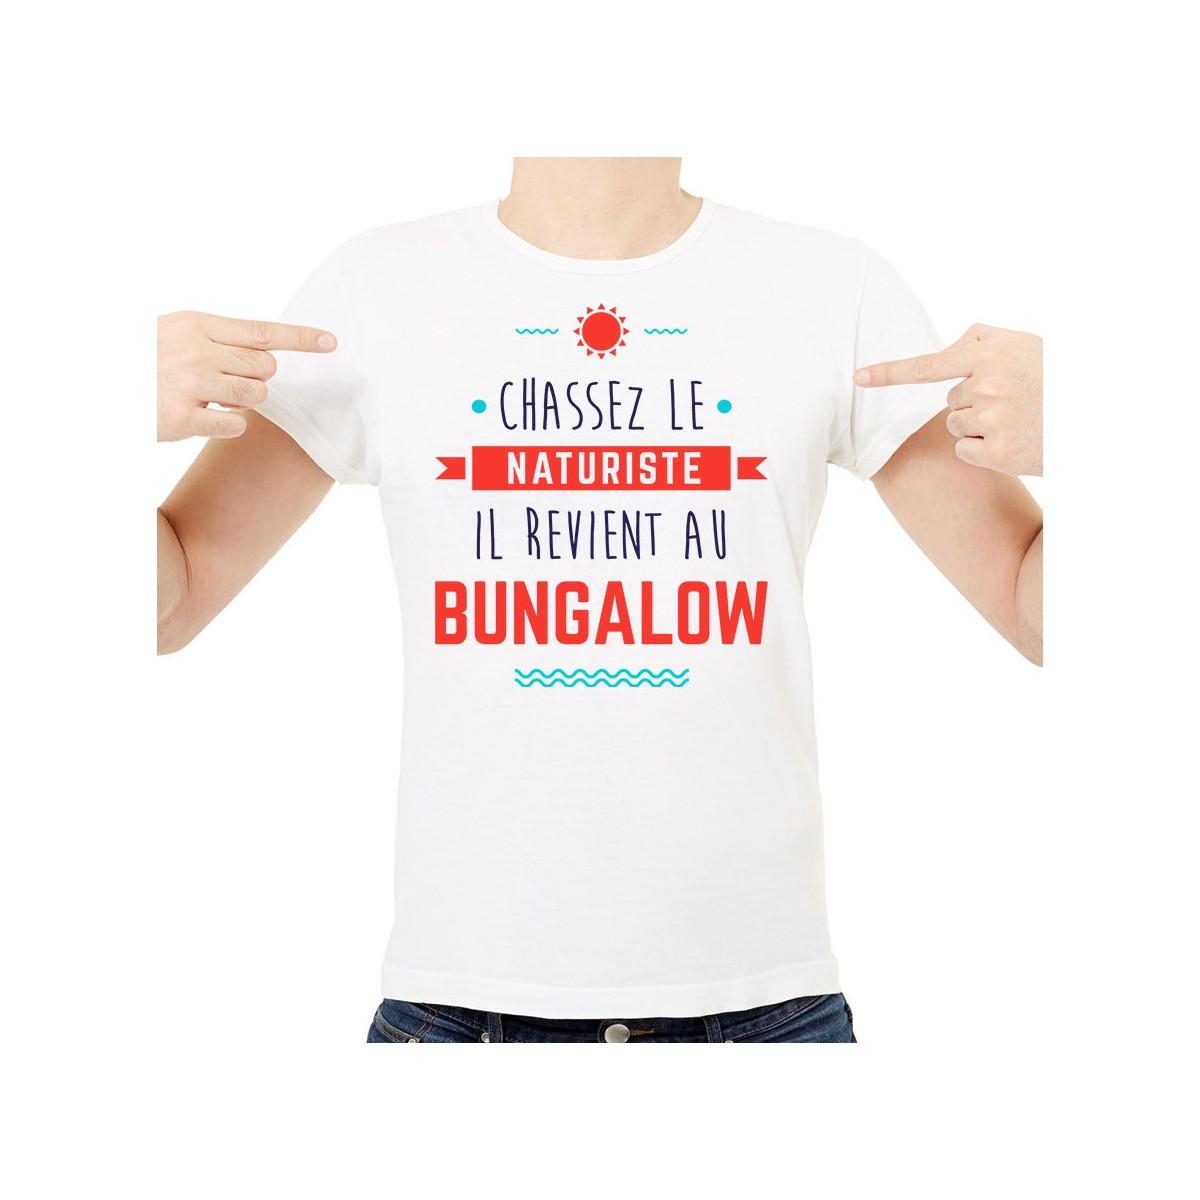 T-shirt Chassez le naturiste